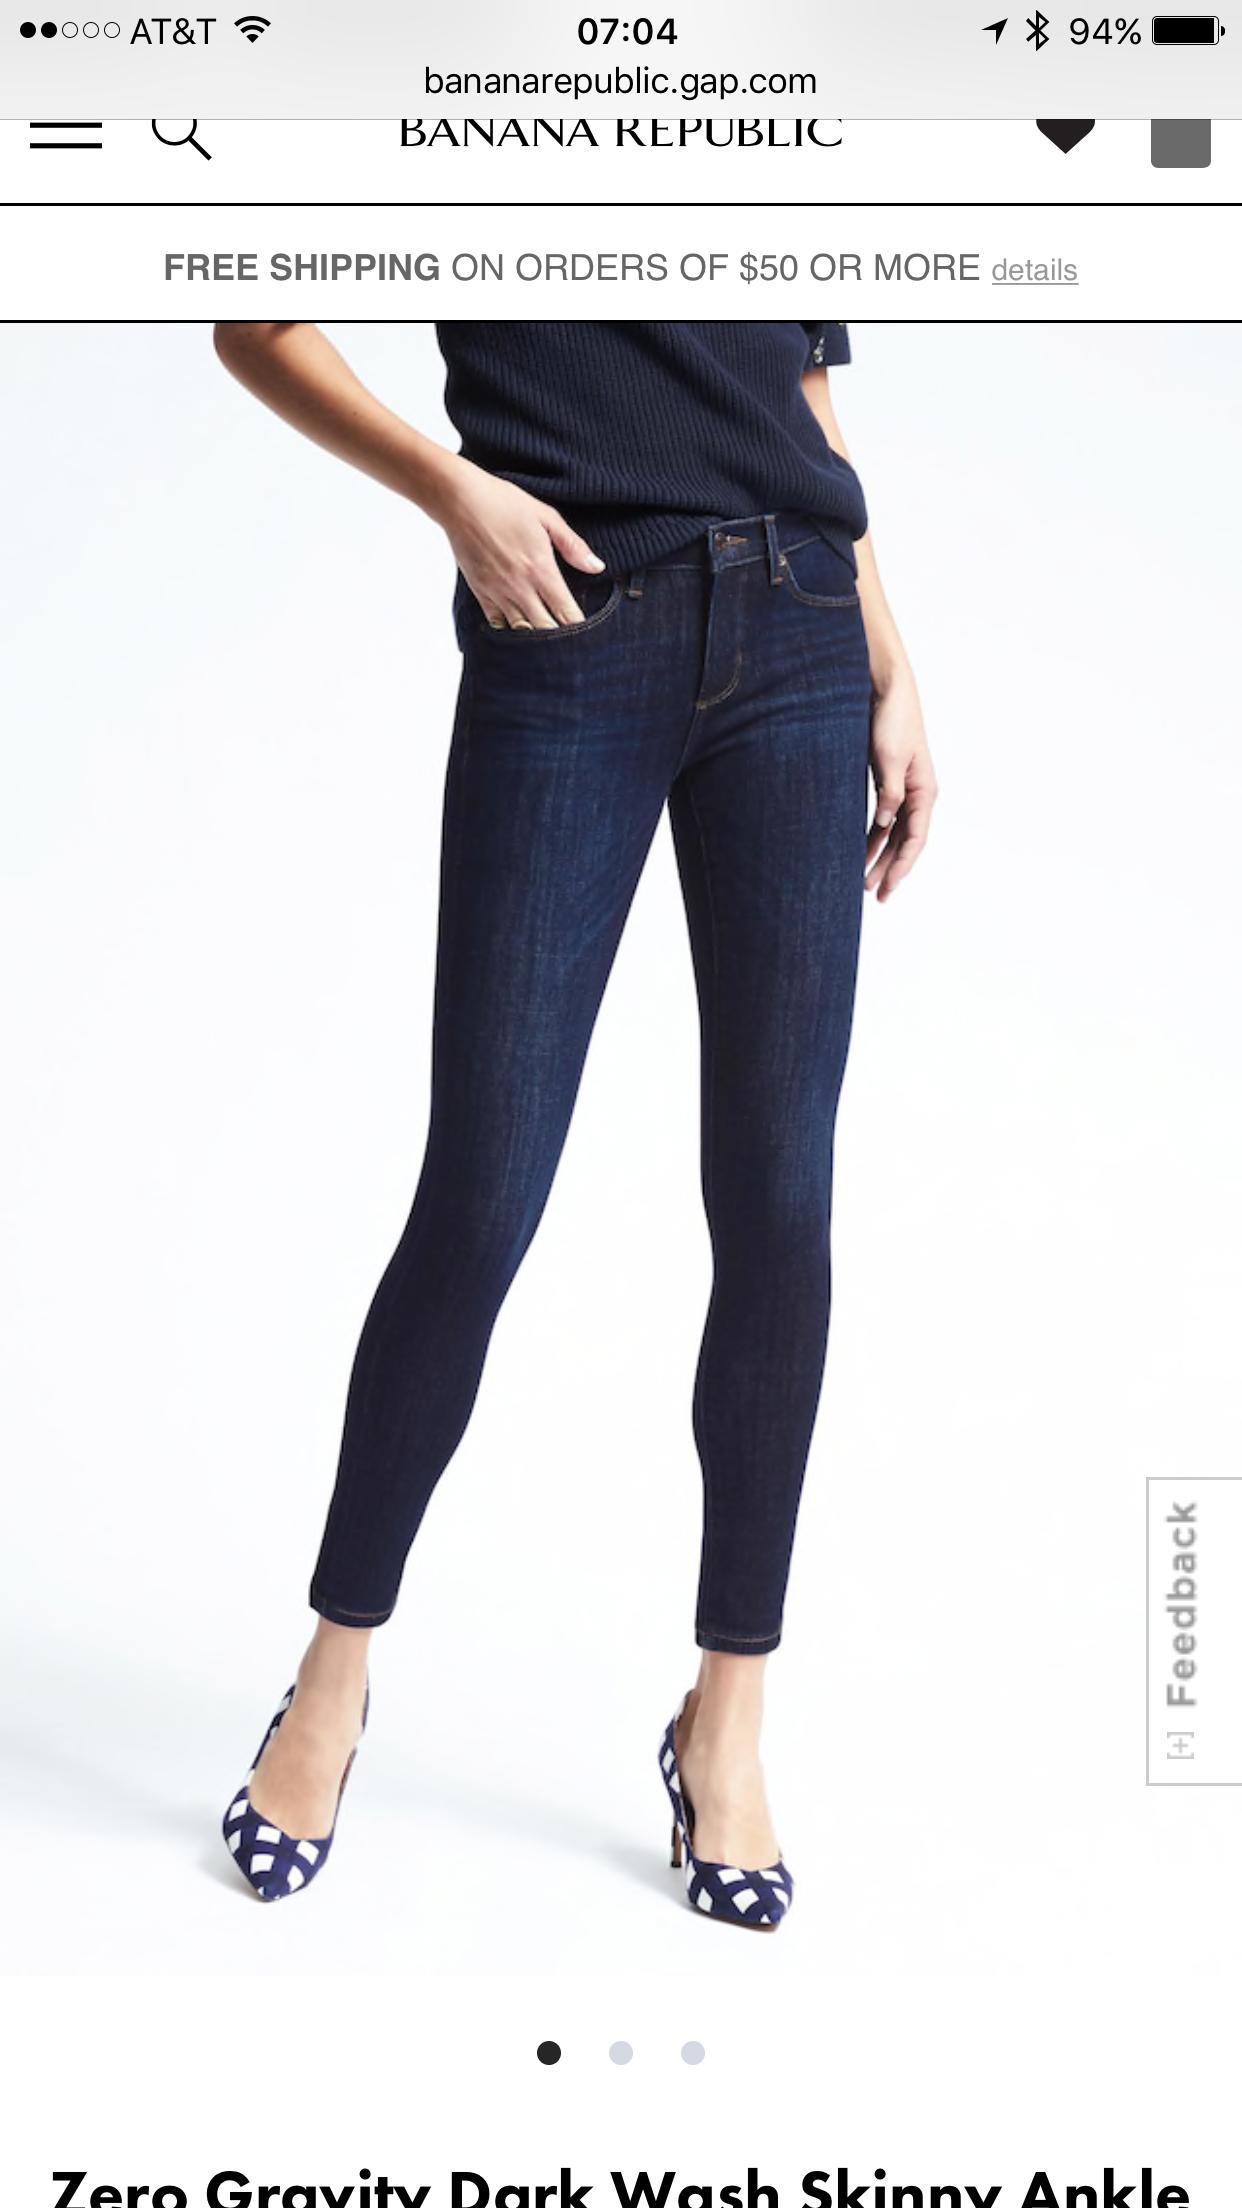 35f518a0d63b9 Banana Republic Zero Gravity Dark Wash Skinny Jeans - Meghan's Mirror